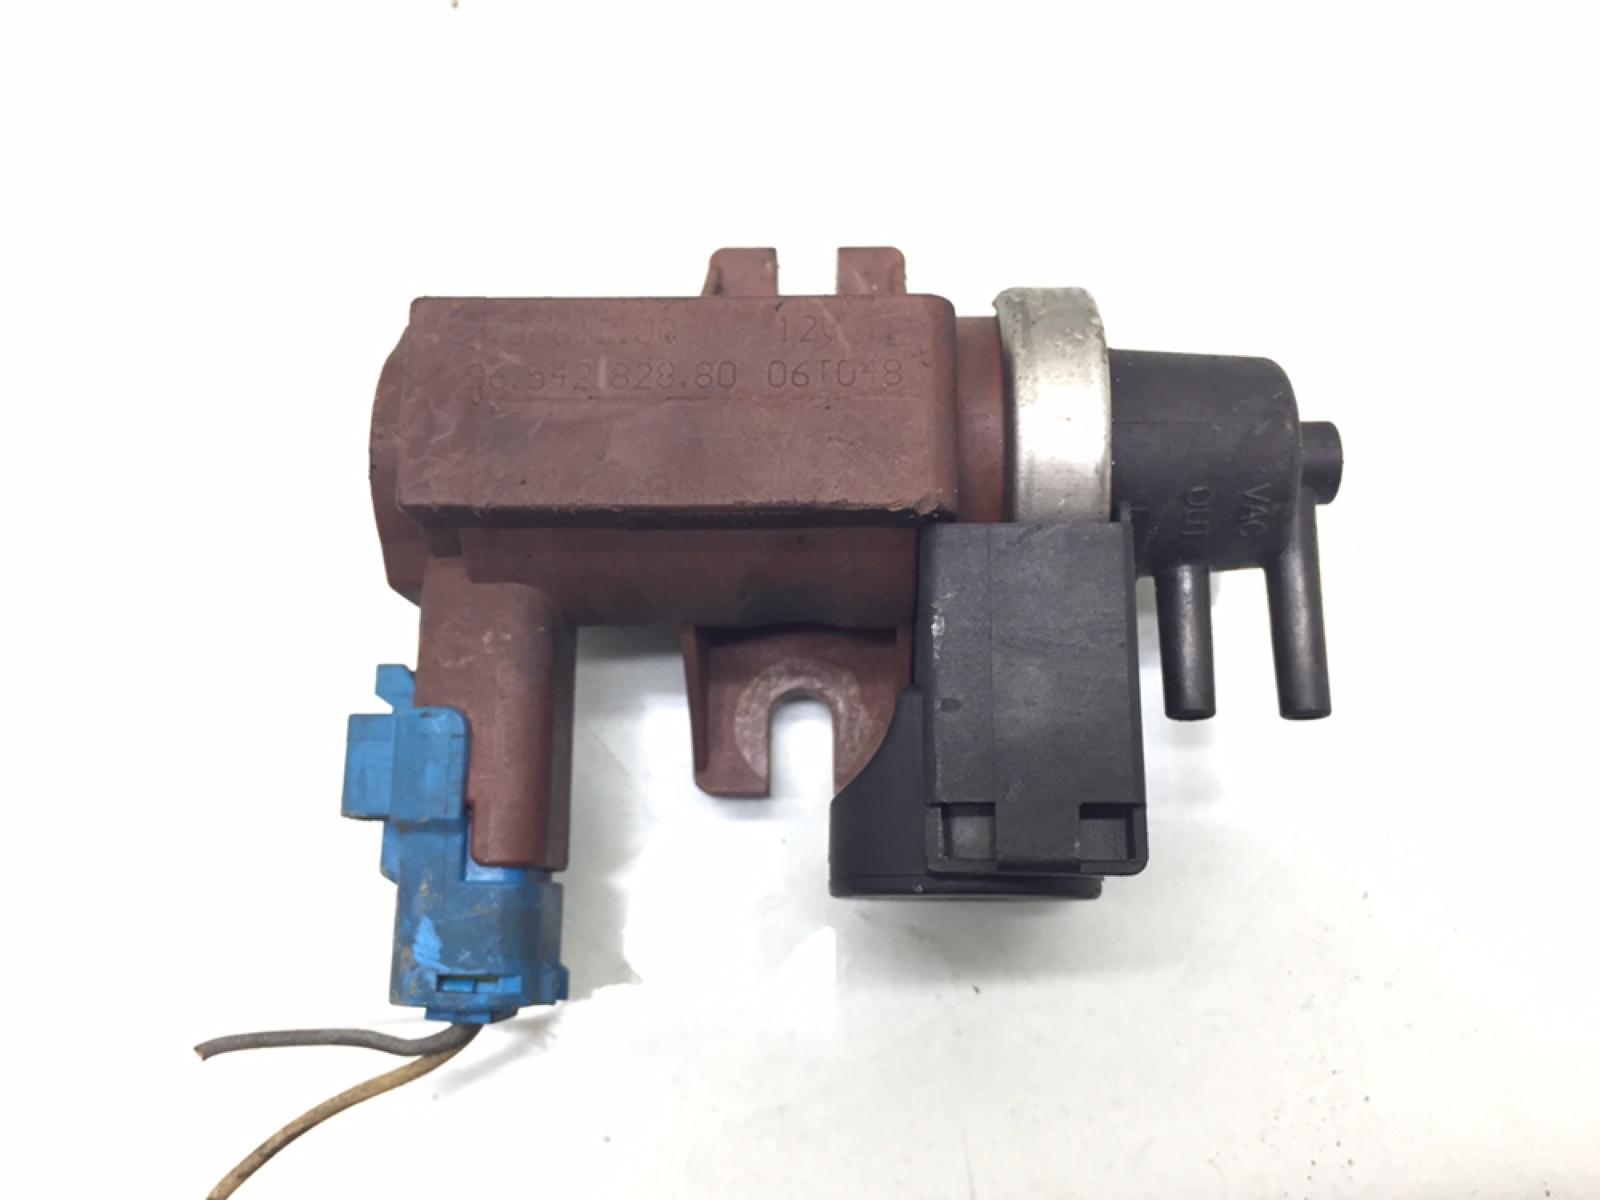 Клапан электромагнитный Peugeot 307 CC 2.0 HDI 2006 (б/у)